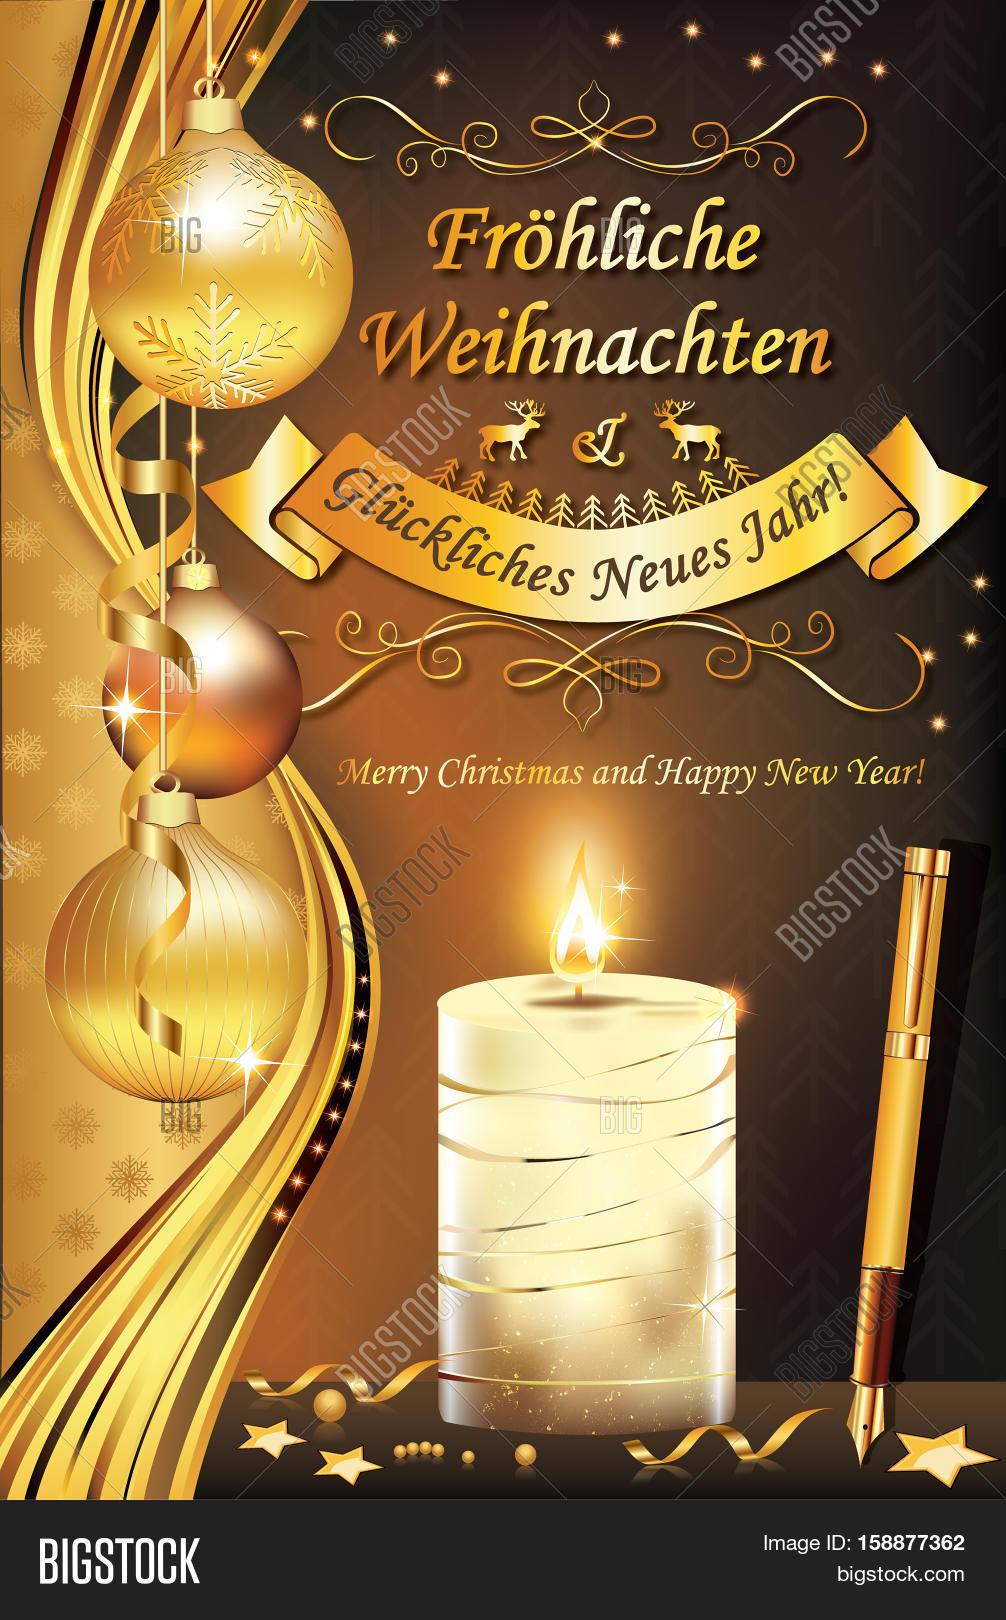 German Greeting Card \' Image & Photo (Free Trial)   Bigstock